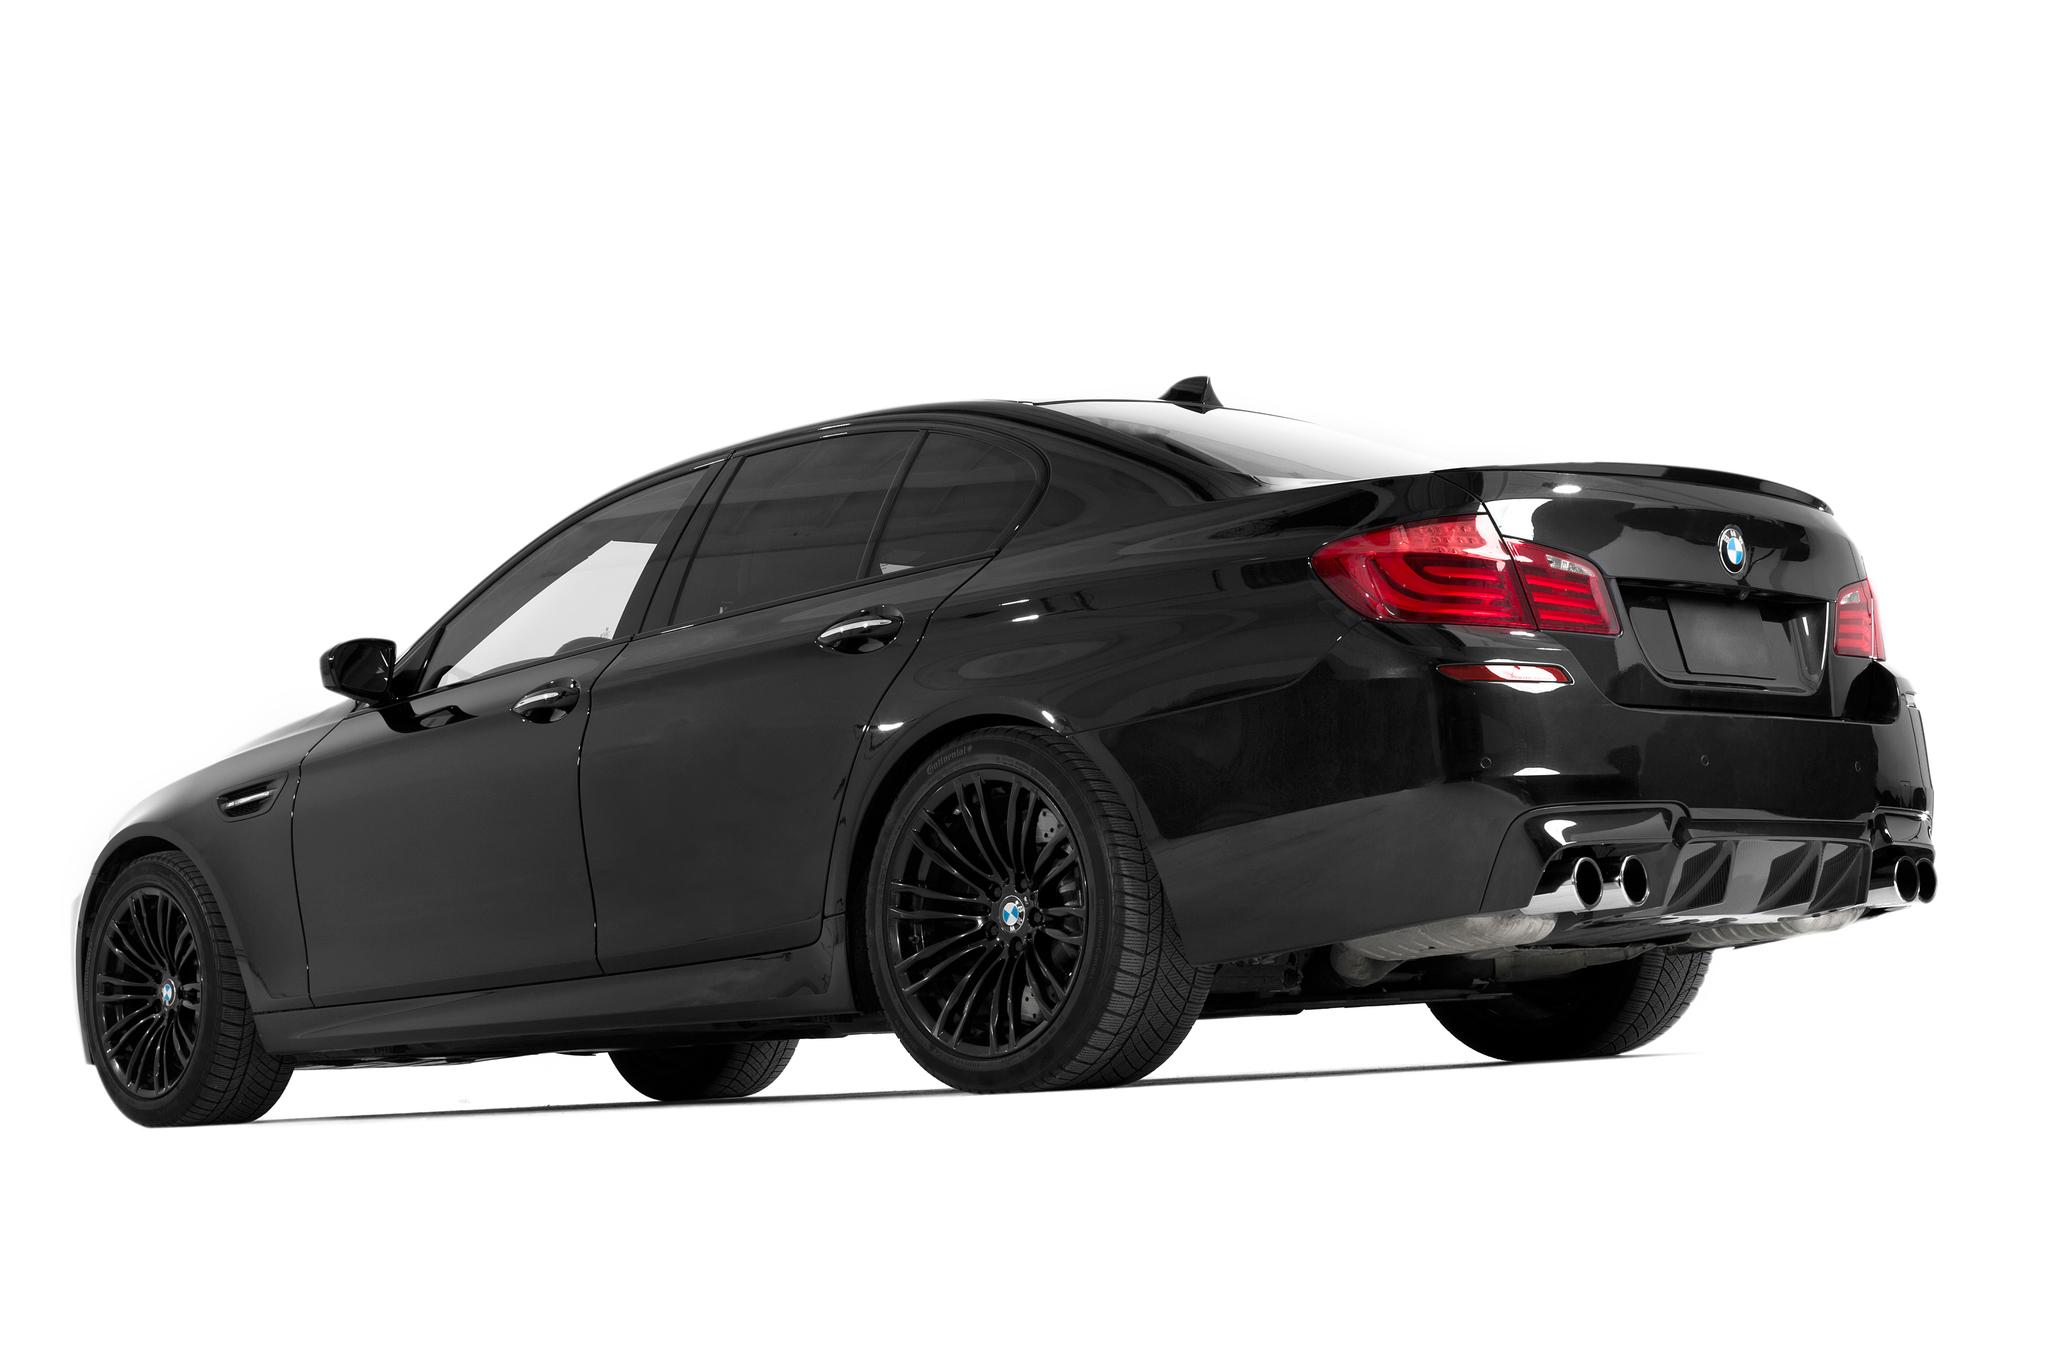 Sterckenn Carbon Fiber diffuser for BMW M5 F10 new model